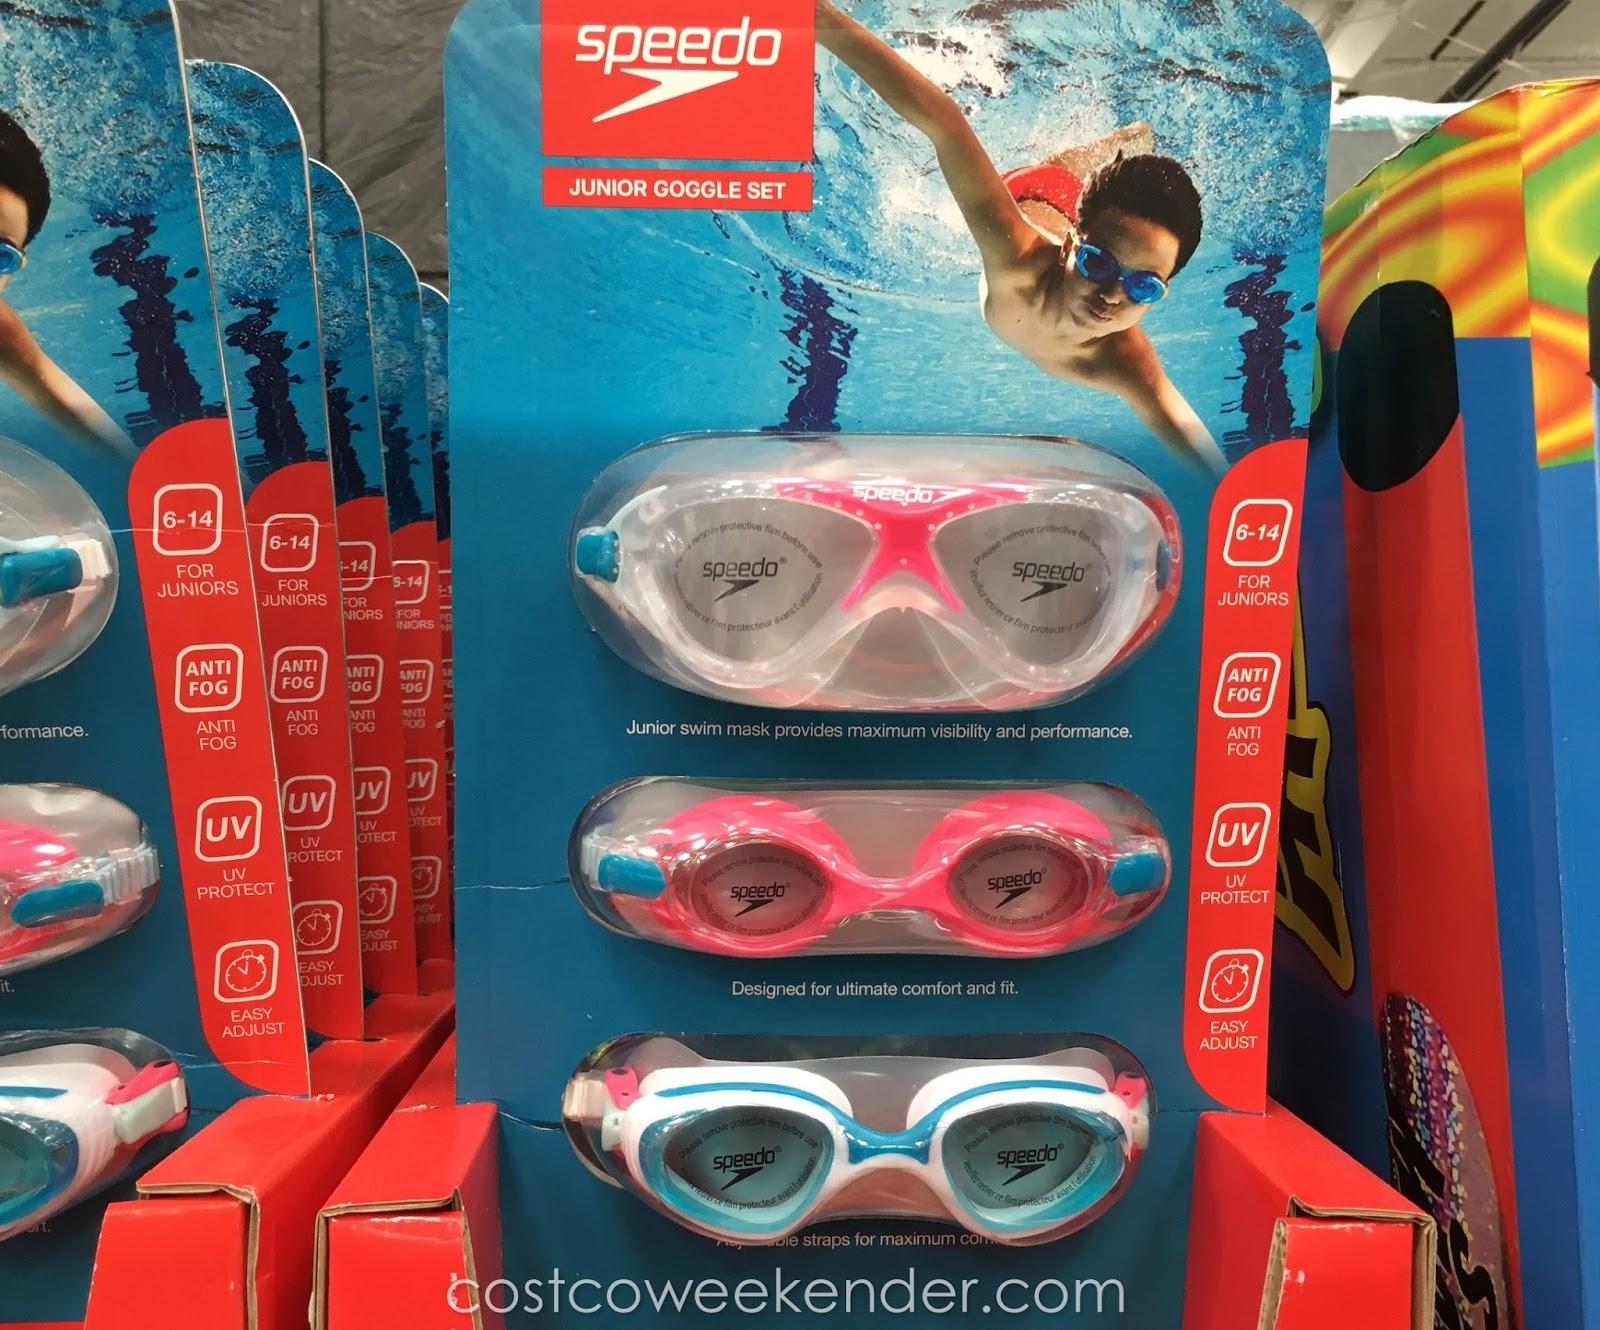 Speedo Junior Swimming Goggles Set 3 Pack Costco Weekender